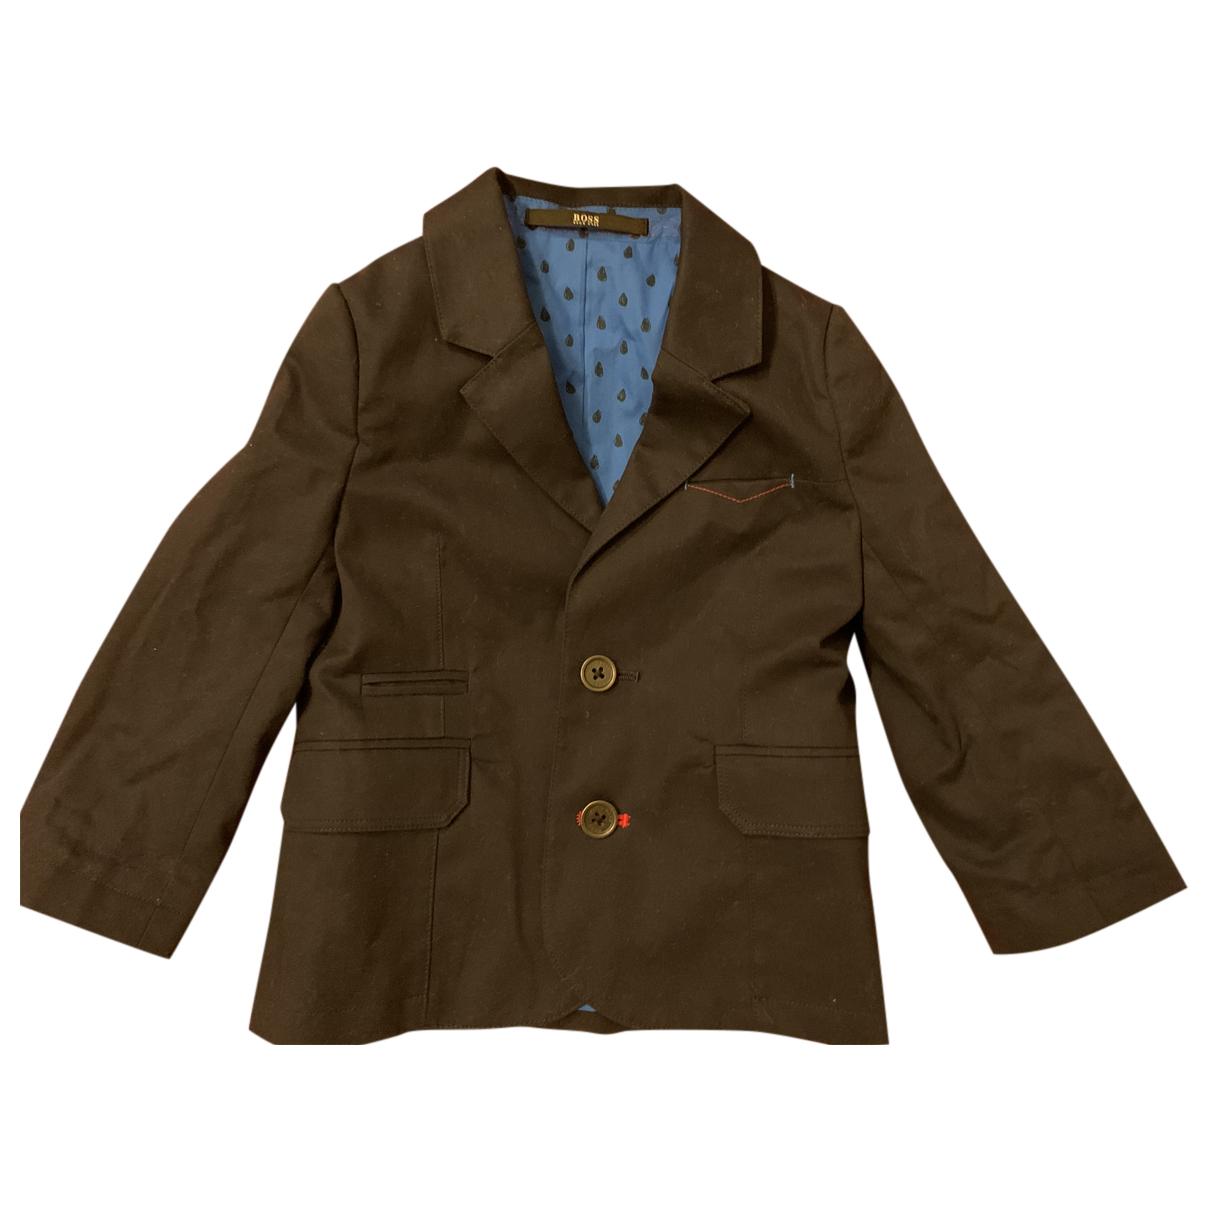 Hugo Boss N Navy Cotton jacket & coat for Kids 18 months - up to 81cm FR